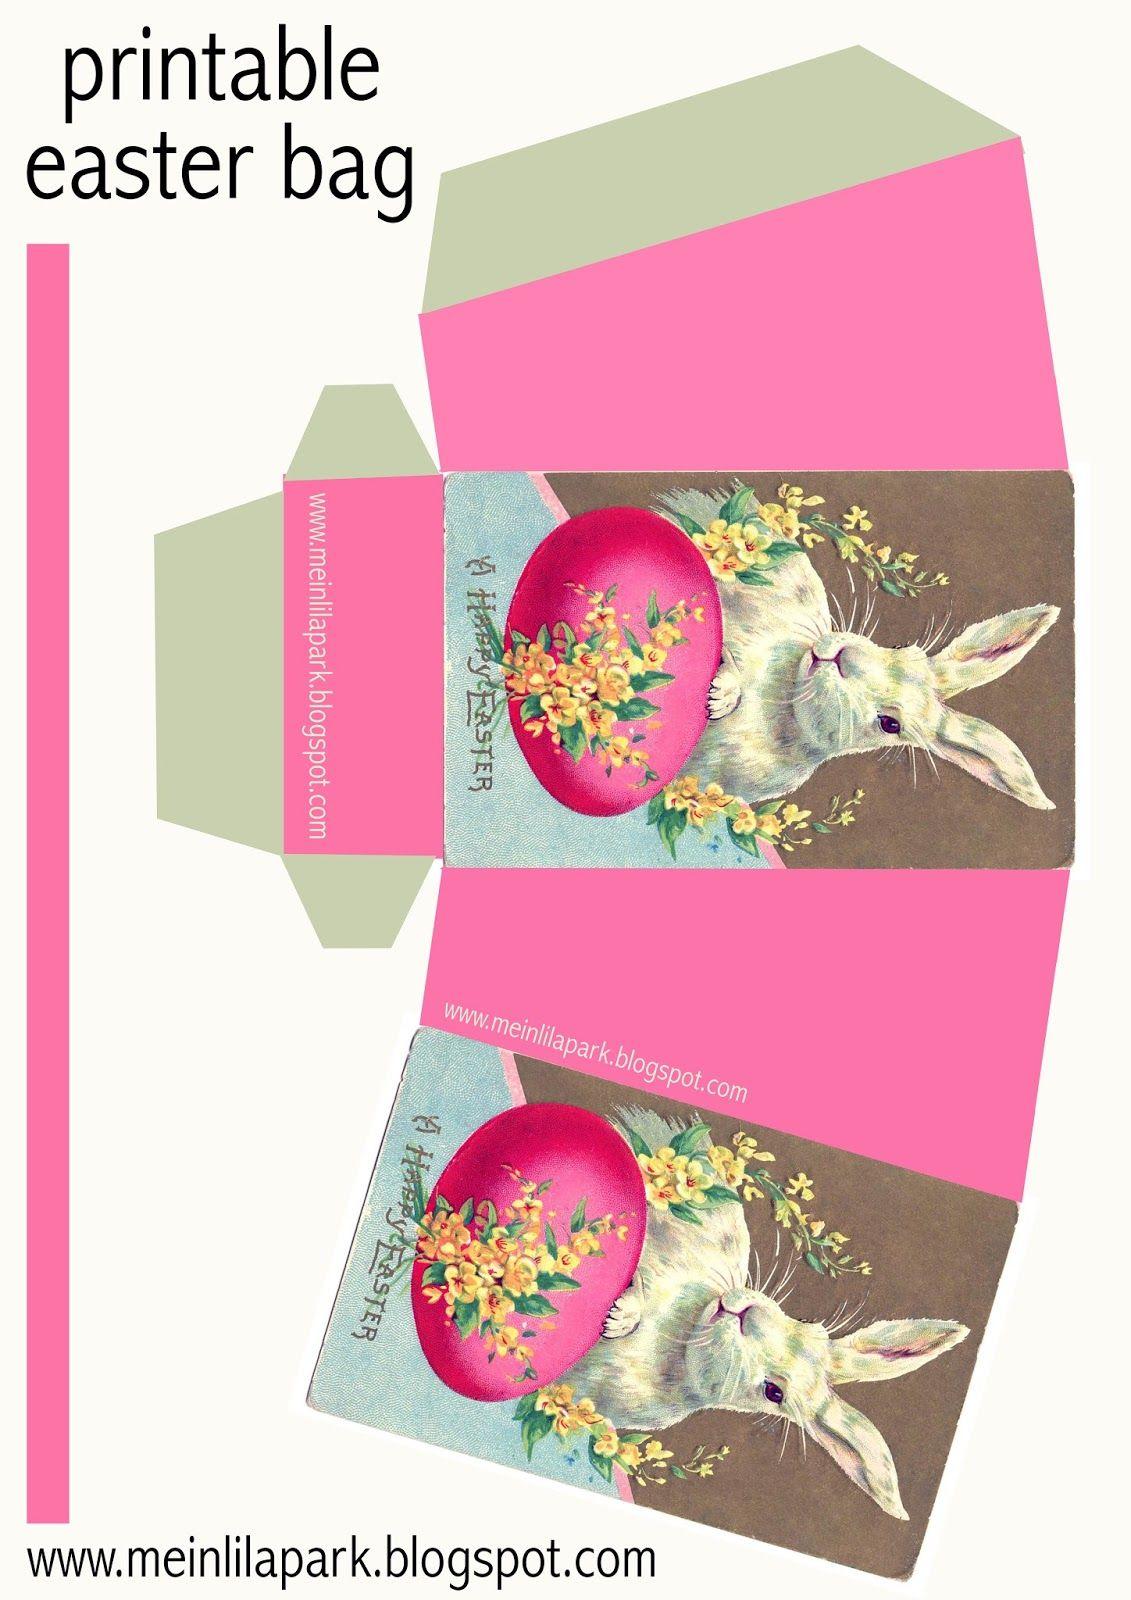 Free printable diy easter bunny box ausdruckbarer osterkorb free printable diy easter bunny box httpmeinlilaparkspot201403 free printable diy easter bunny boxml negle Choice Image